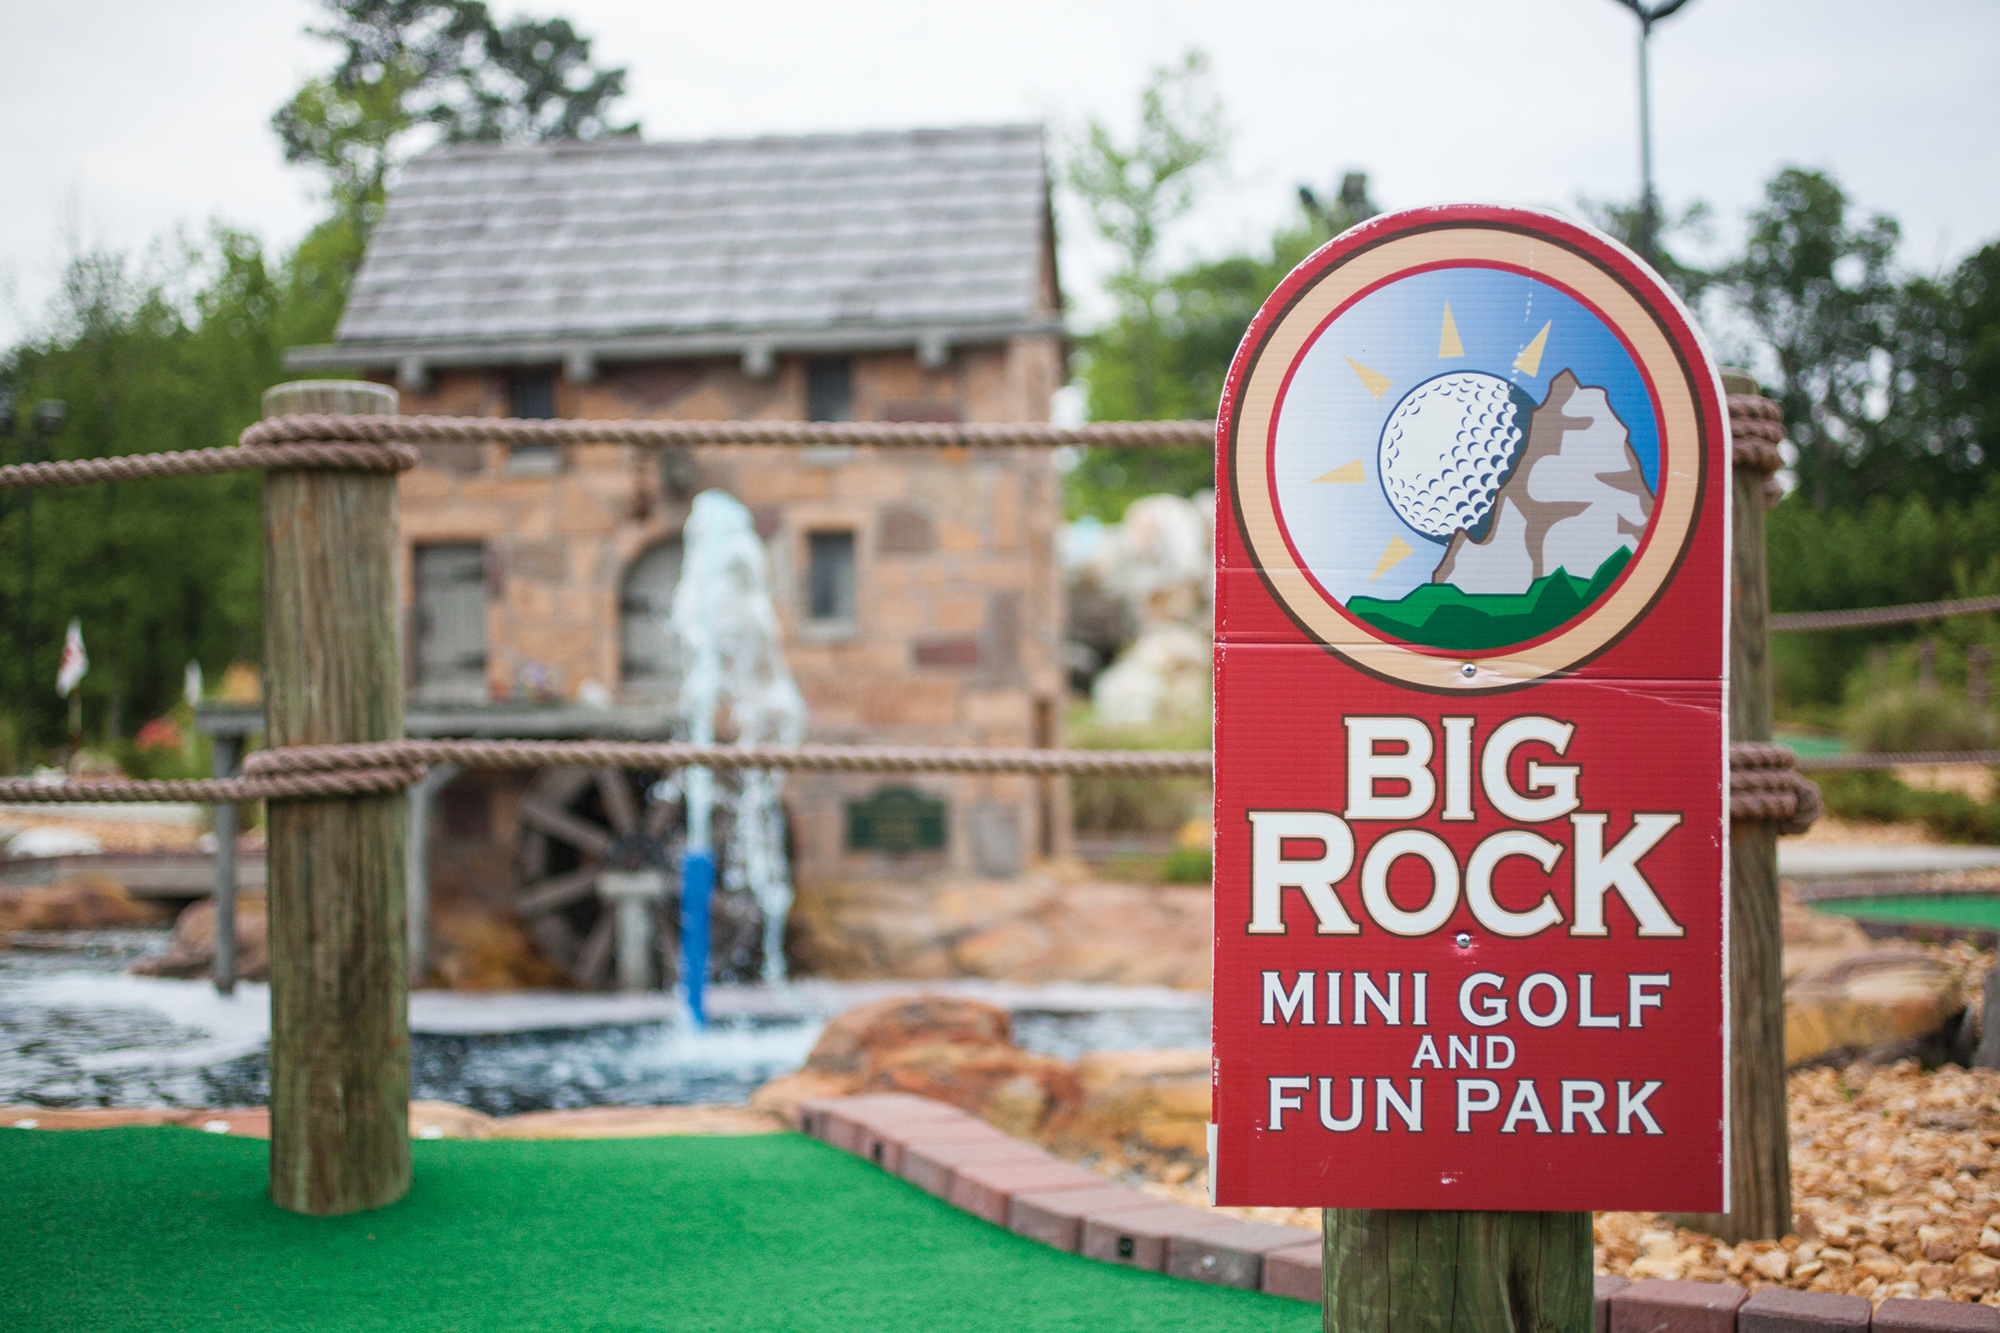 Big Rock Mini Golf and Fun Park